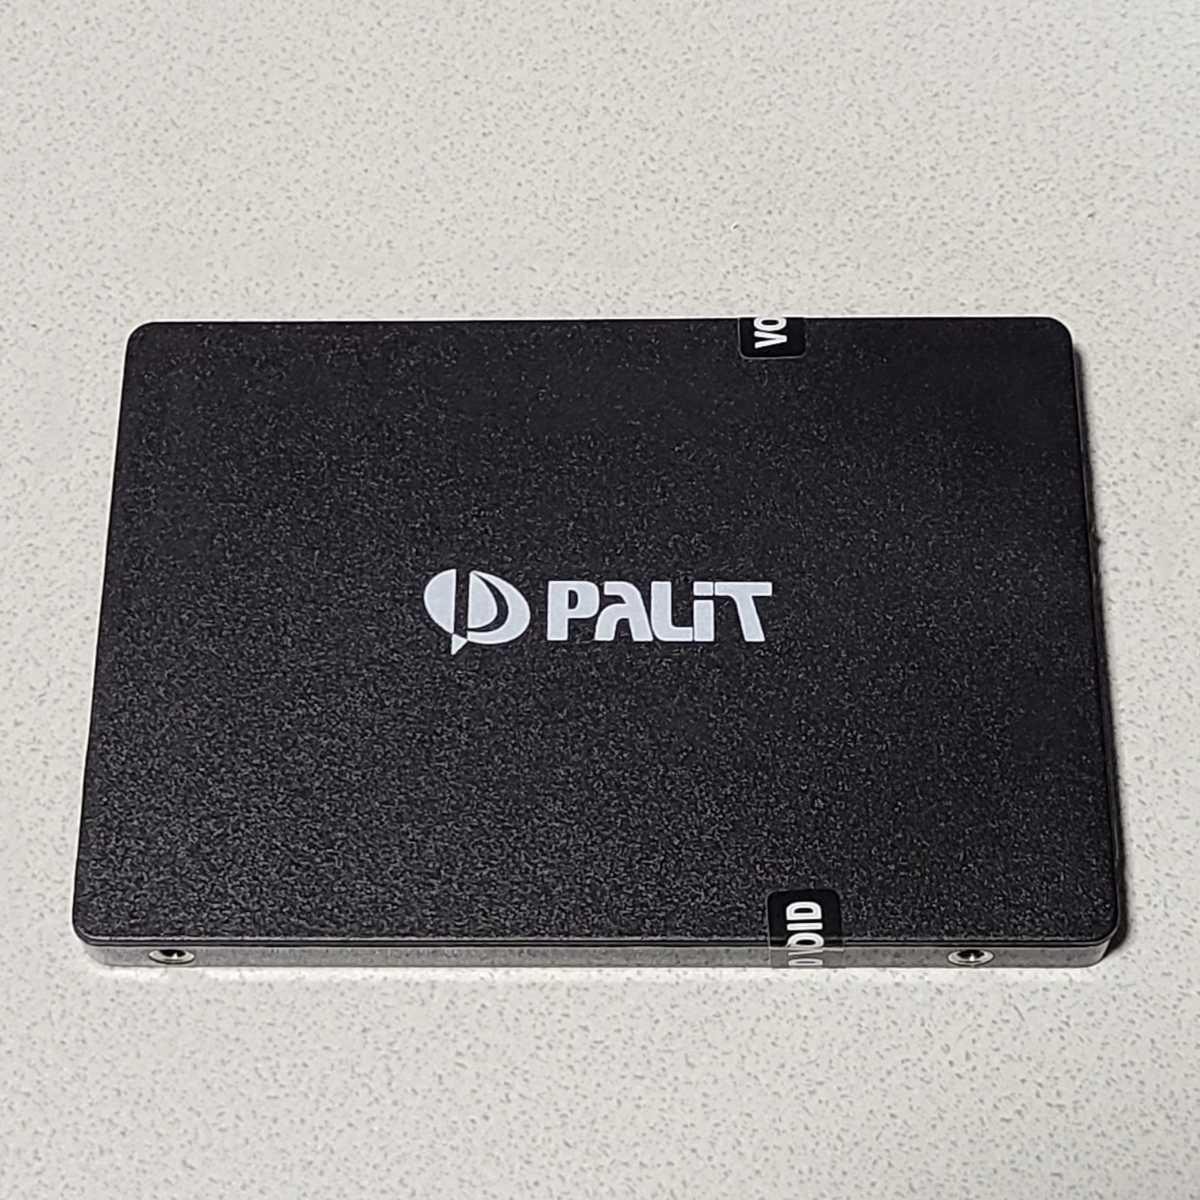 PALIT UVS-SSD240 240GB SATA SSD 正常品 2.5インチ内蔵SSD フォーマット済み PCパーツ 動作確認済み 250GB 256GB